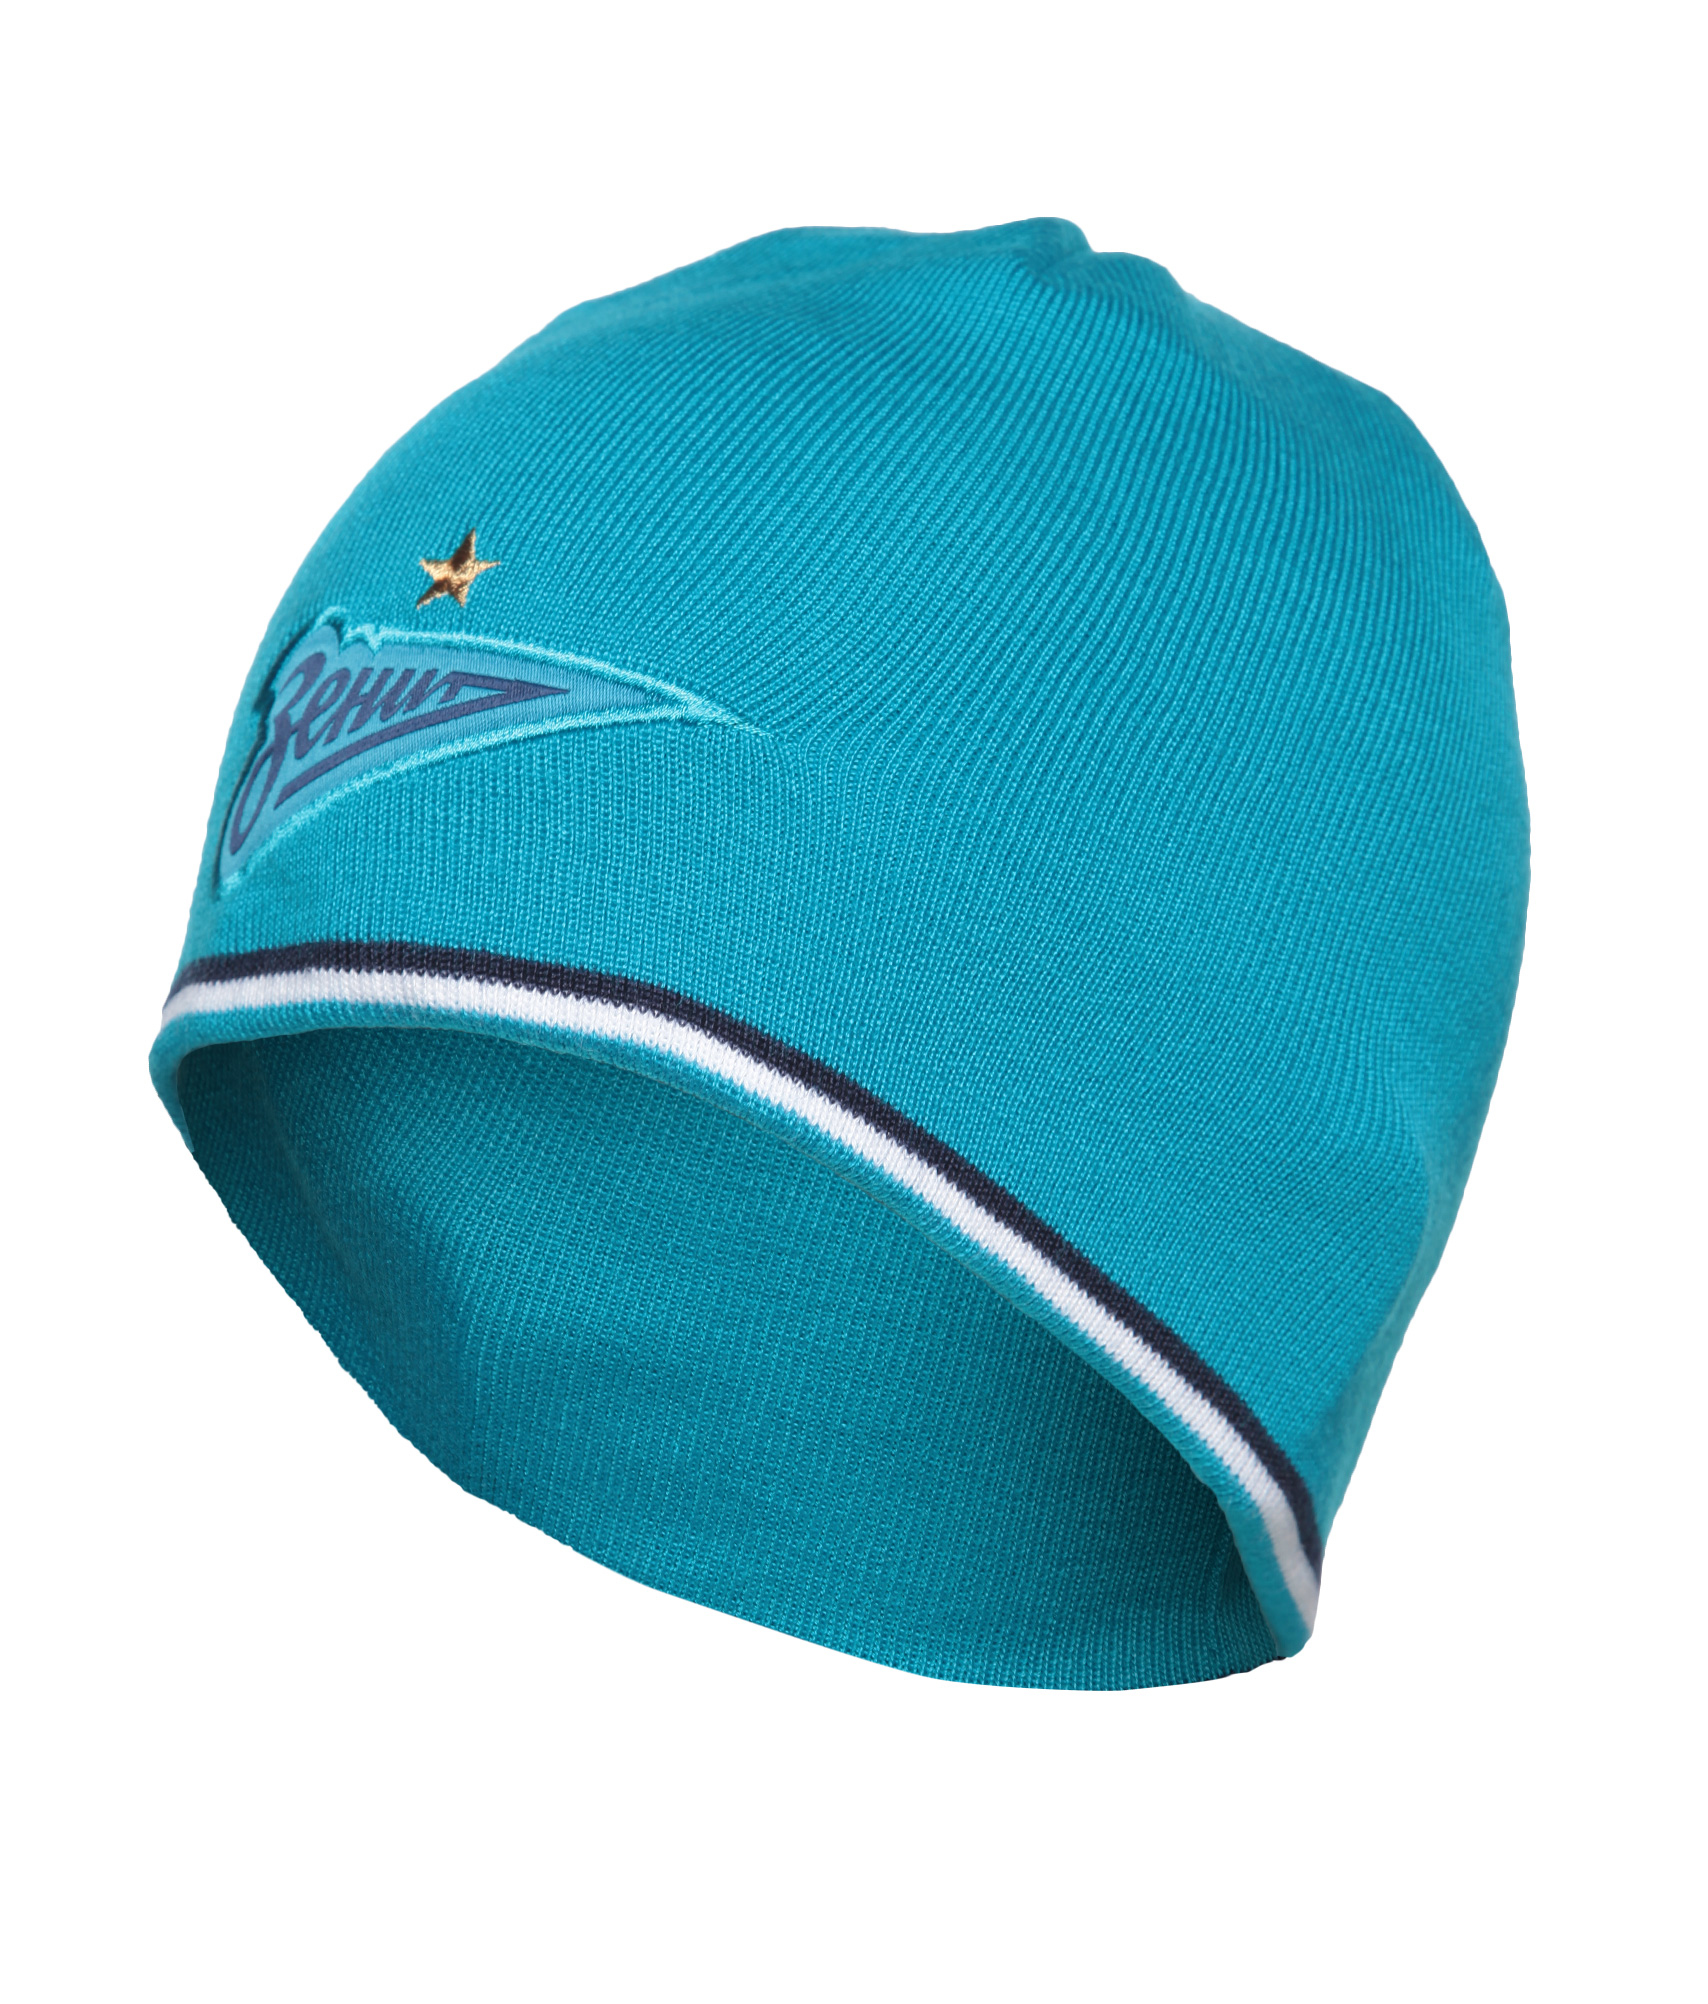 Шапка мужская Зенит Цвет-Лазурный шапка мужская зенит